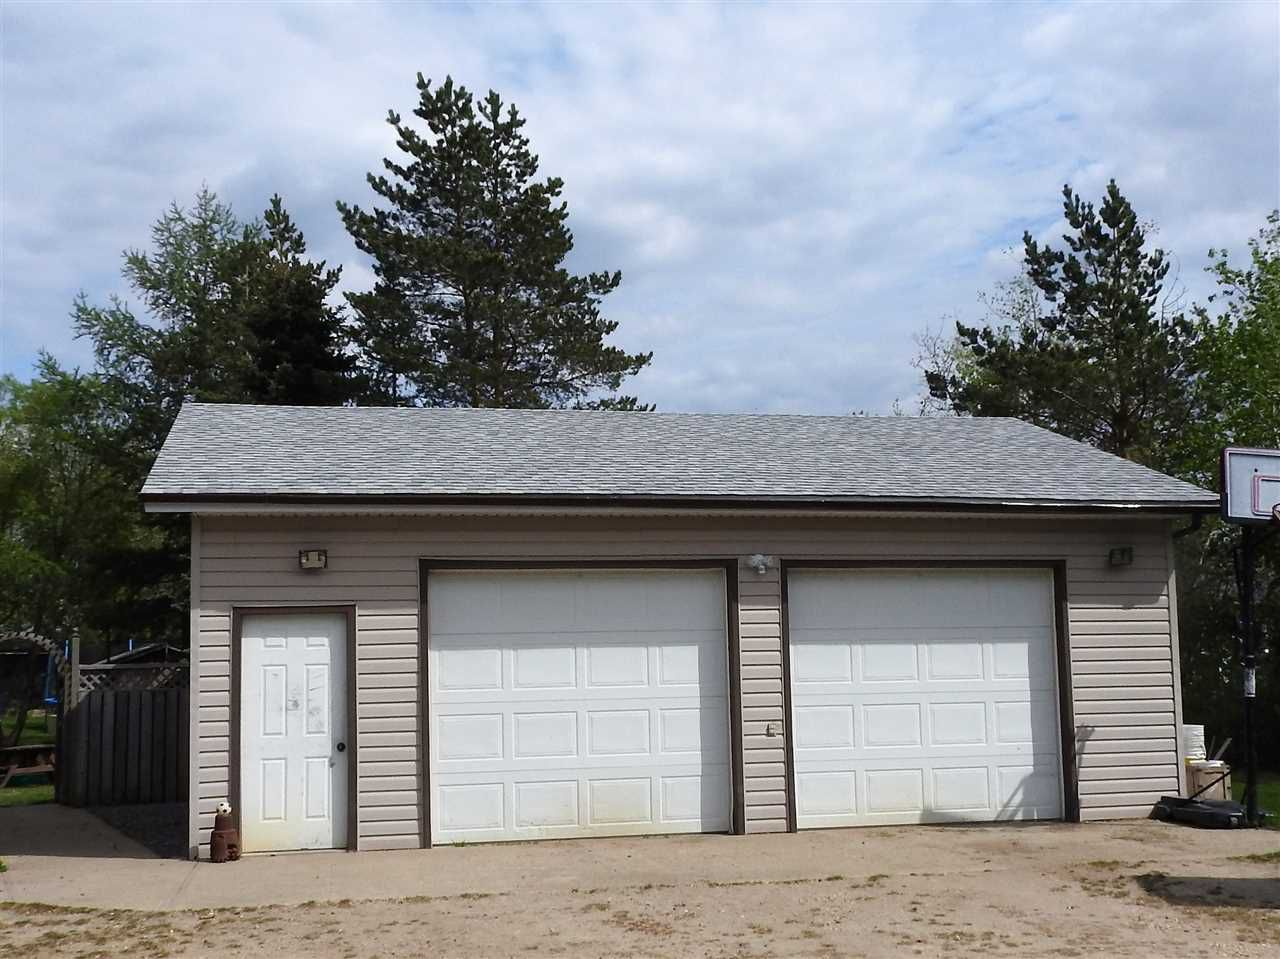 Photo 4: Photos: 55301 RGE RD 262: Rural Sturgeon County House for sale : MLS®# E4158158